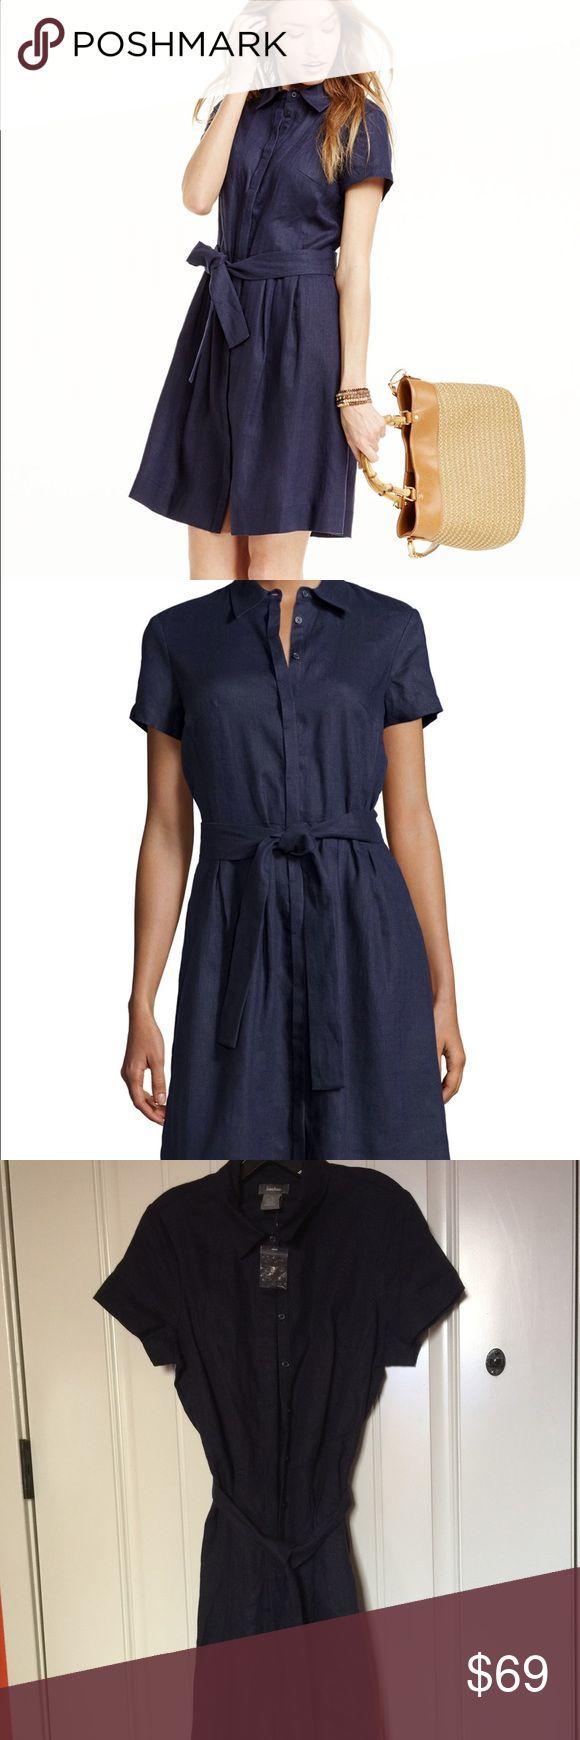 Black dress neiman marcus - Neiman Marcus Linen Navy Dress Navy Color 100 Linen Let Me Know If